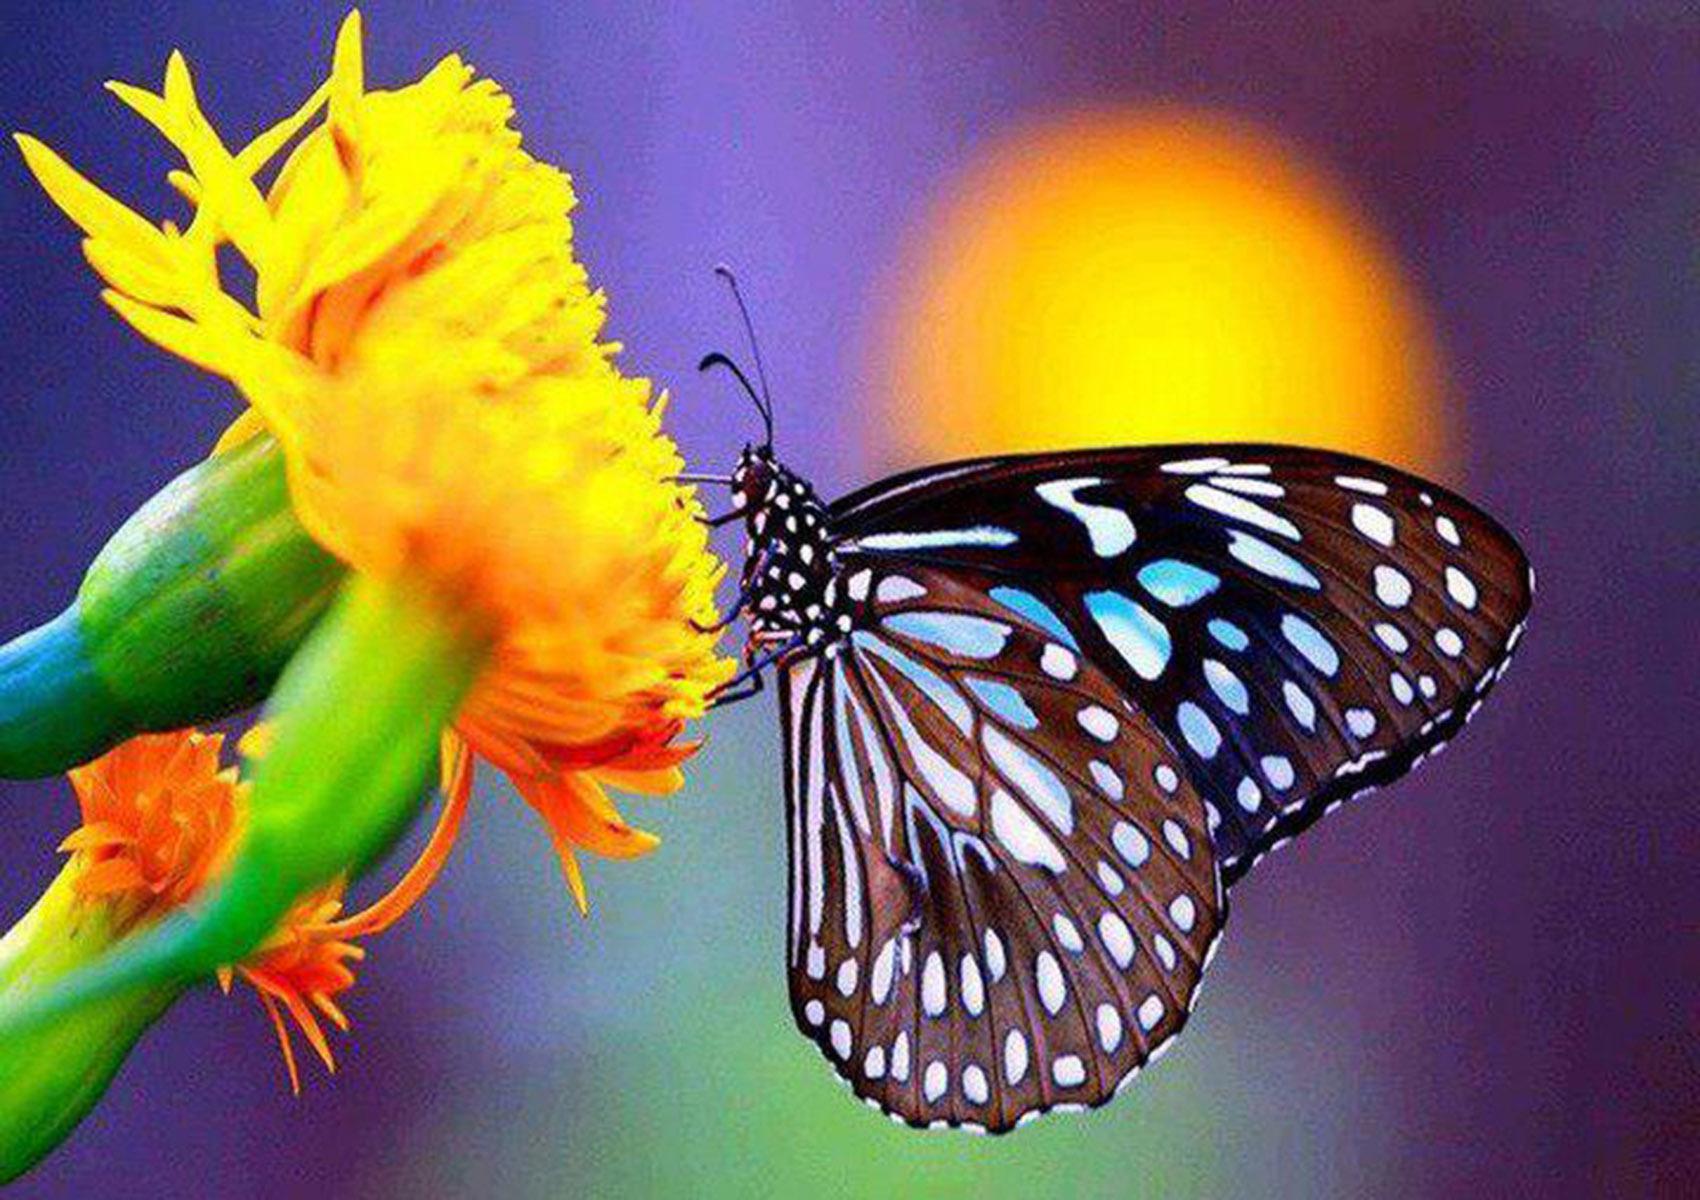 Butterfly On A Flower Wallpapers - Butterfly , HD Wallpaper & Backgrounds